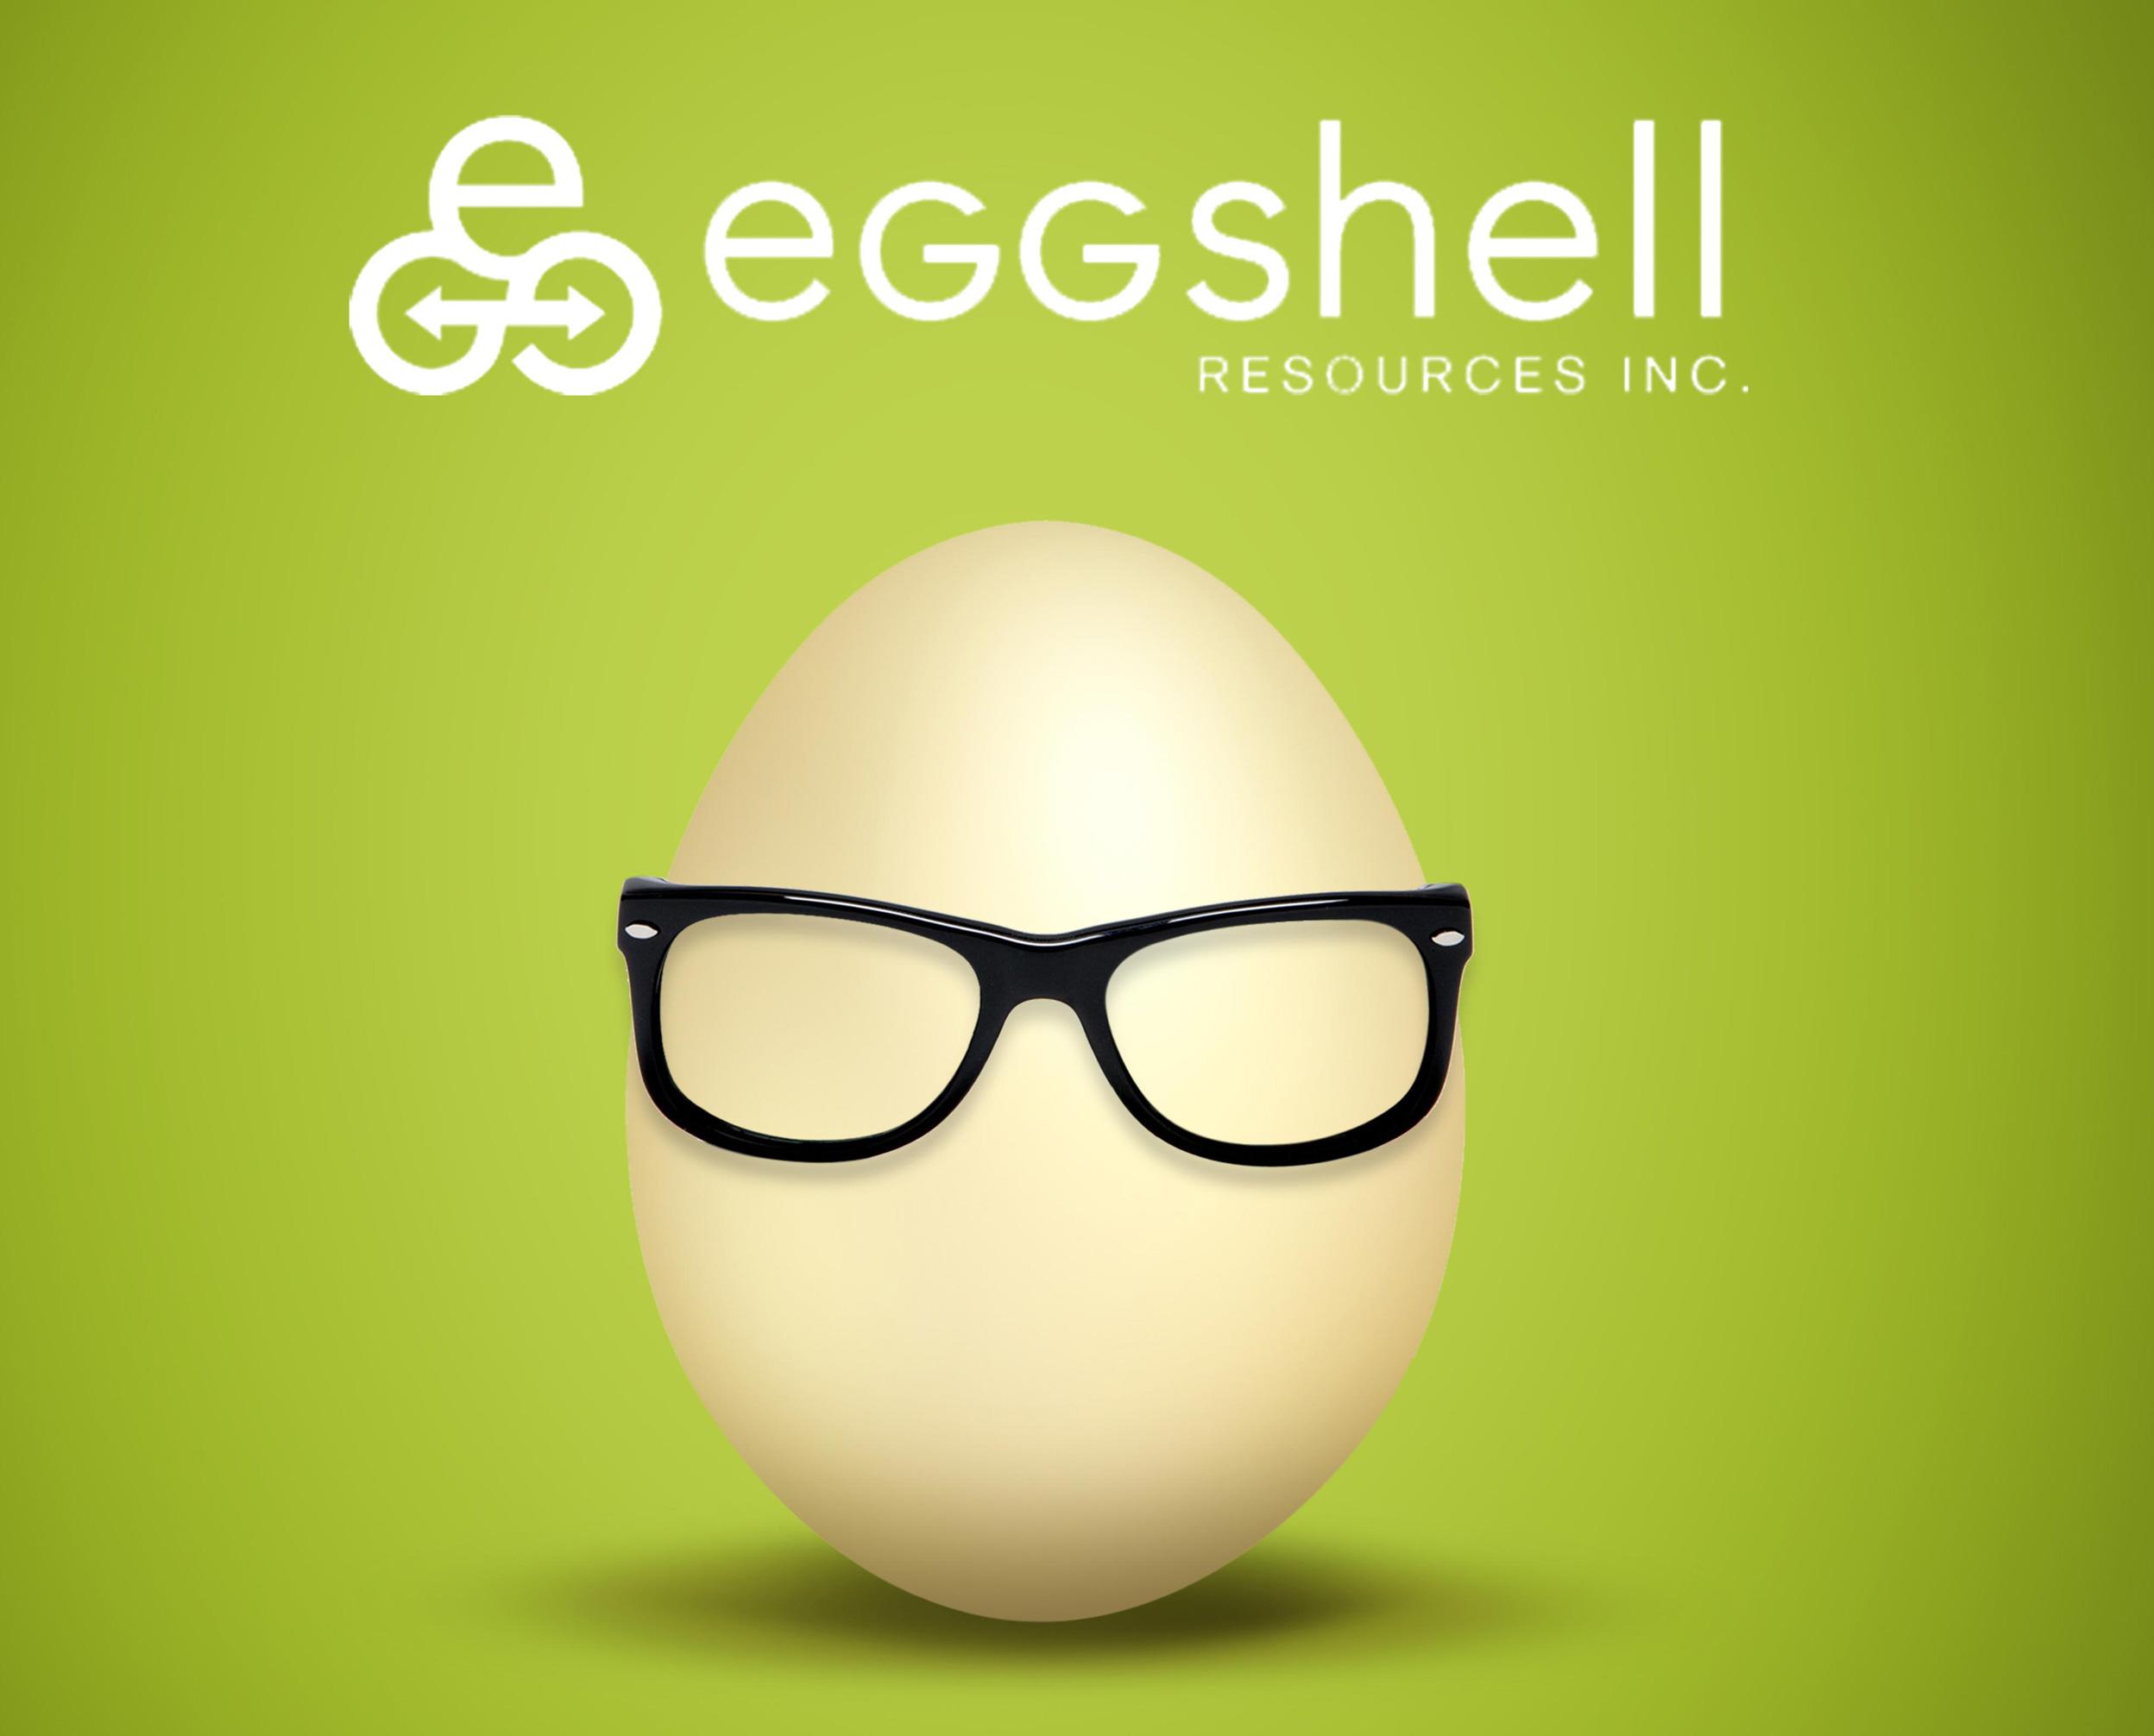 Eggshell Resources branding